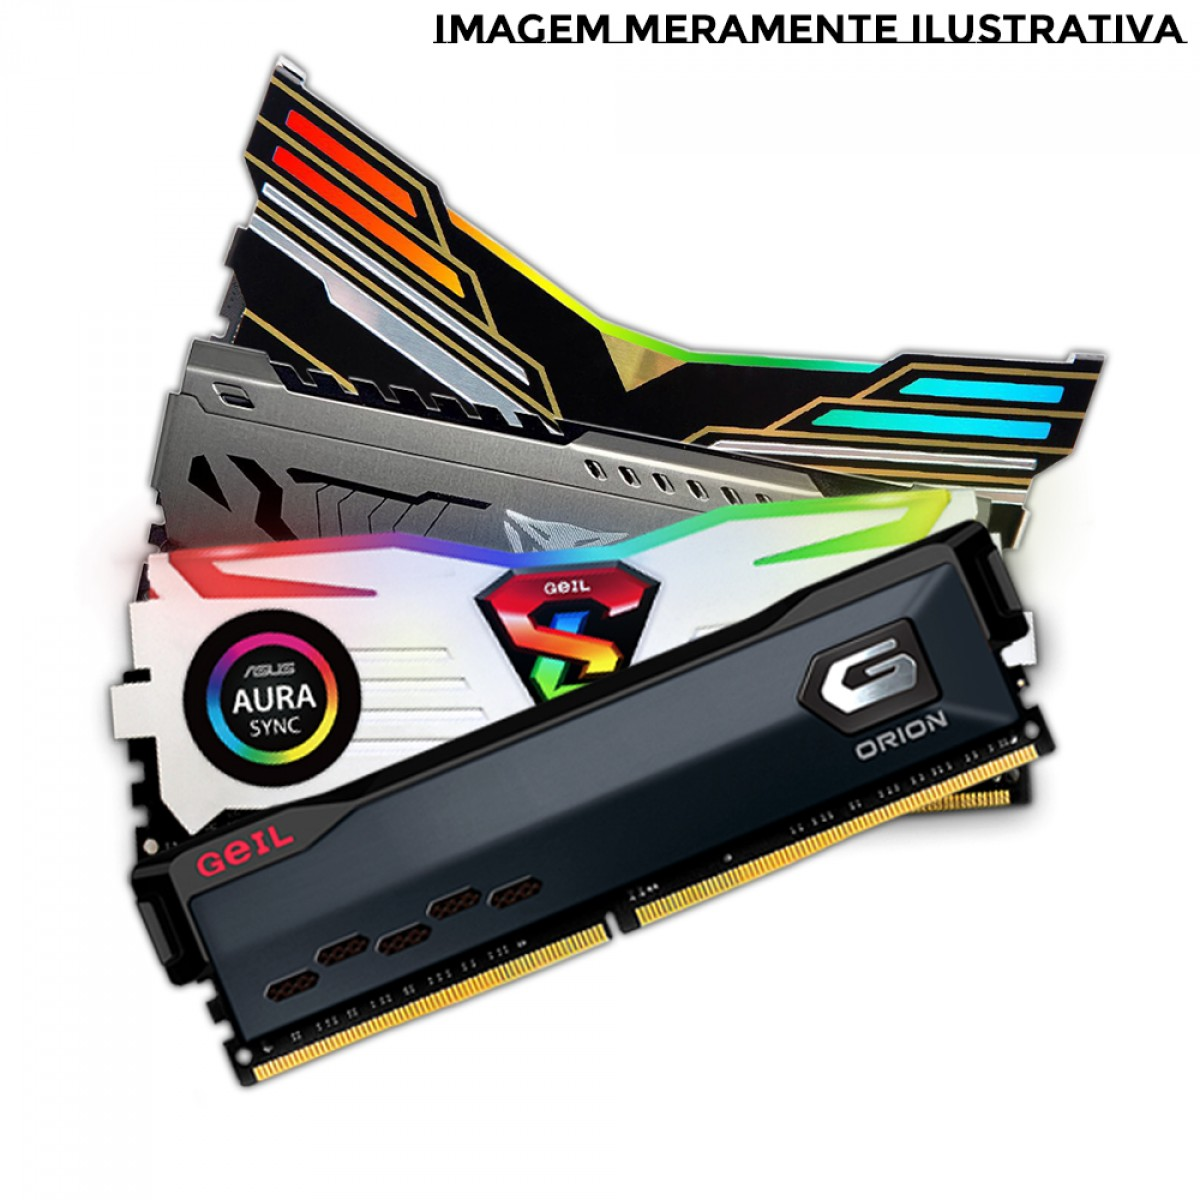 Kit Upgrade, AMD Ryzen 5 3400G, Asus Prime A320M-K, Memória DDR4 16GB (2x8GB) 3000MHz